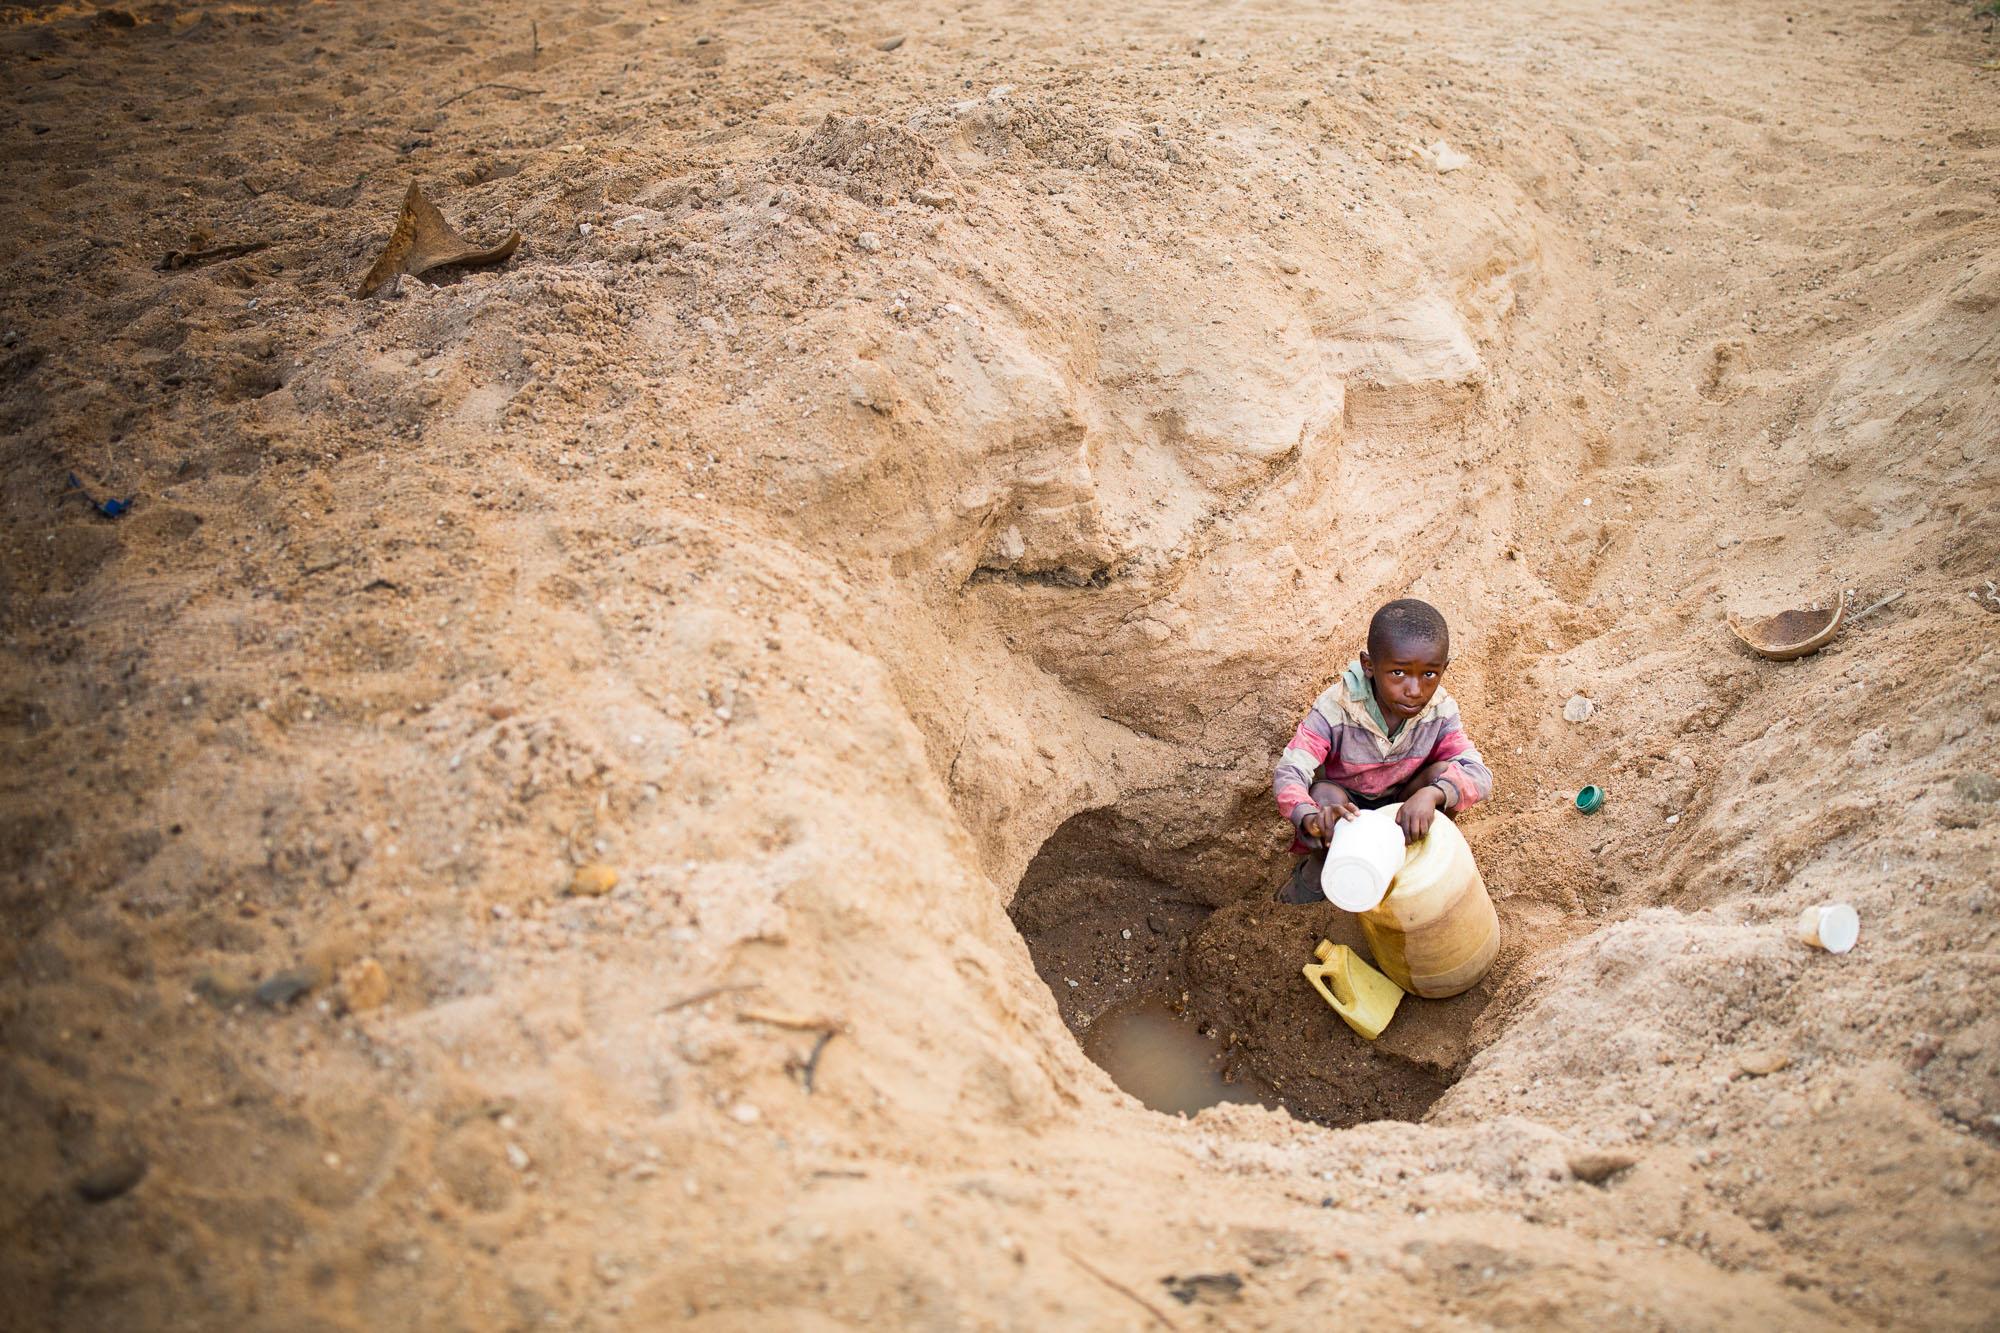 Mwangela (8) digs for water in a dry riverbed in Makueni County, Kenya.